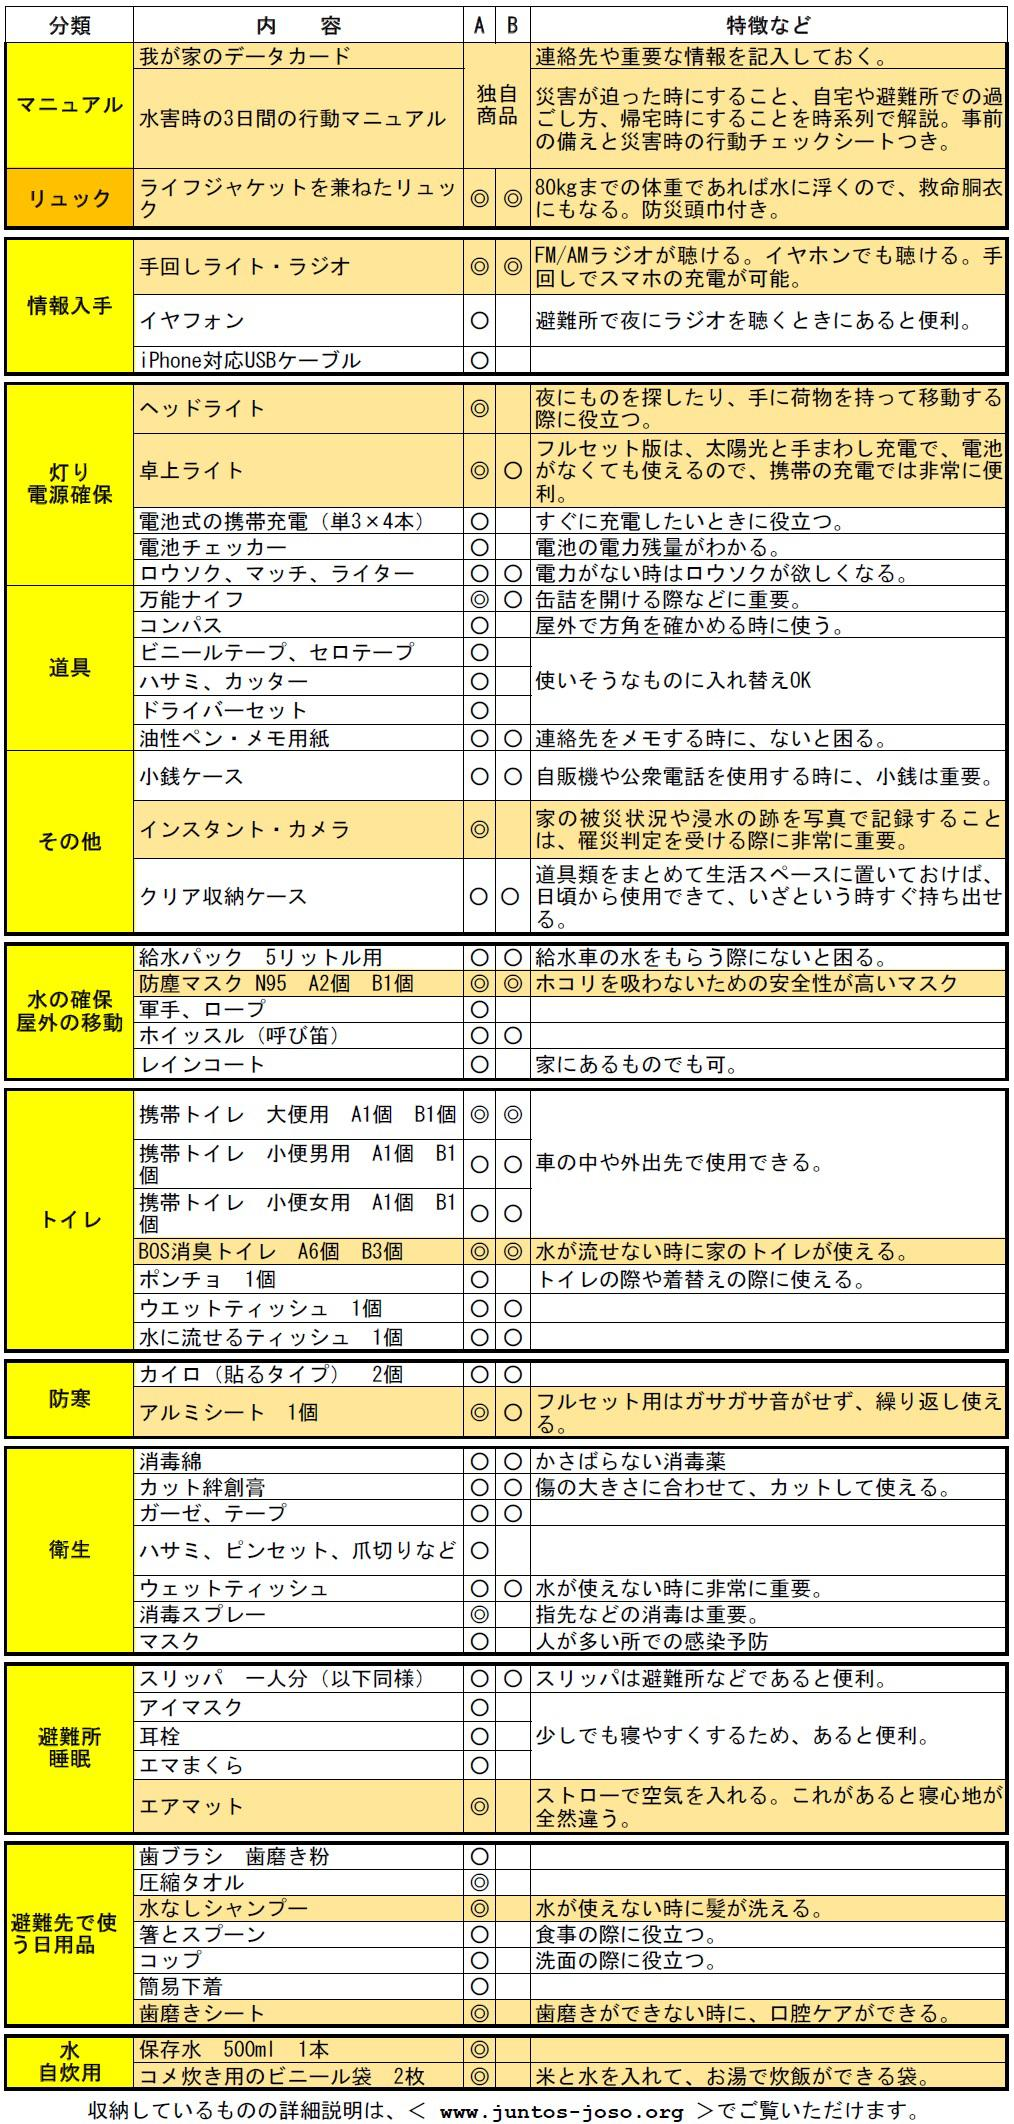 bosai-goods-contents20180909.jpg